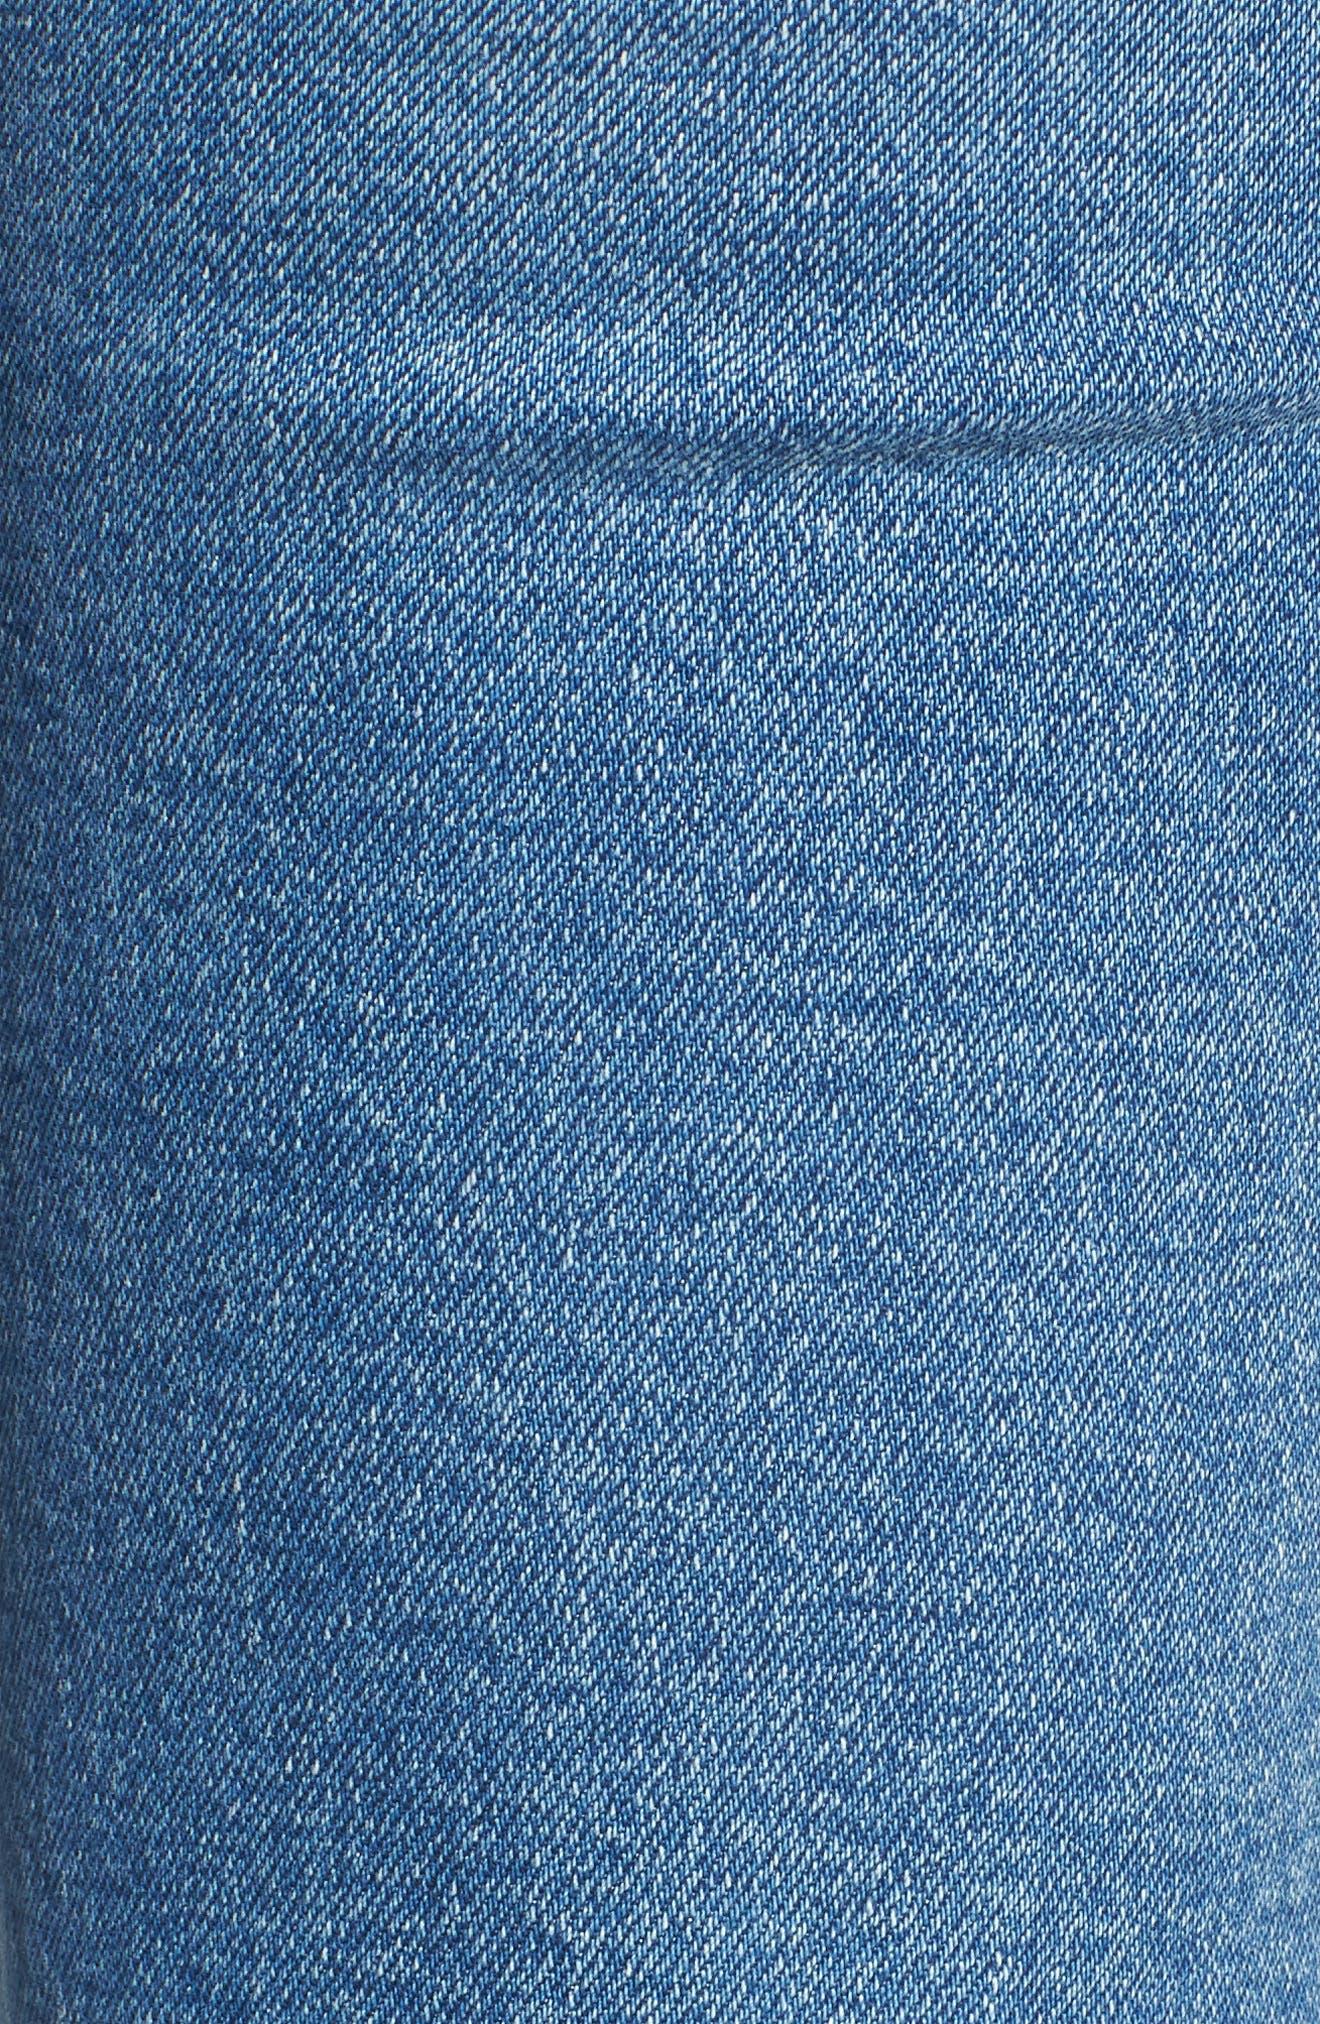 Zoeey High Waist Cuff Straight Leg Jeans,                             Alternate thumbnail 6, color,                             425